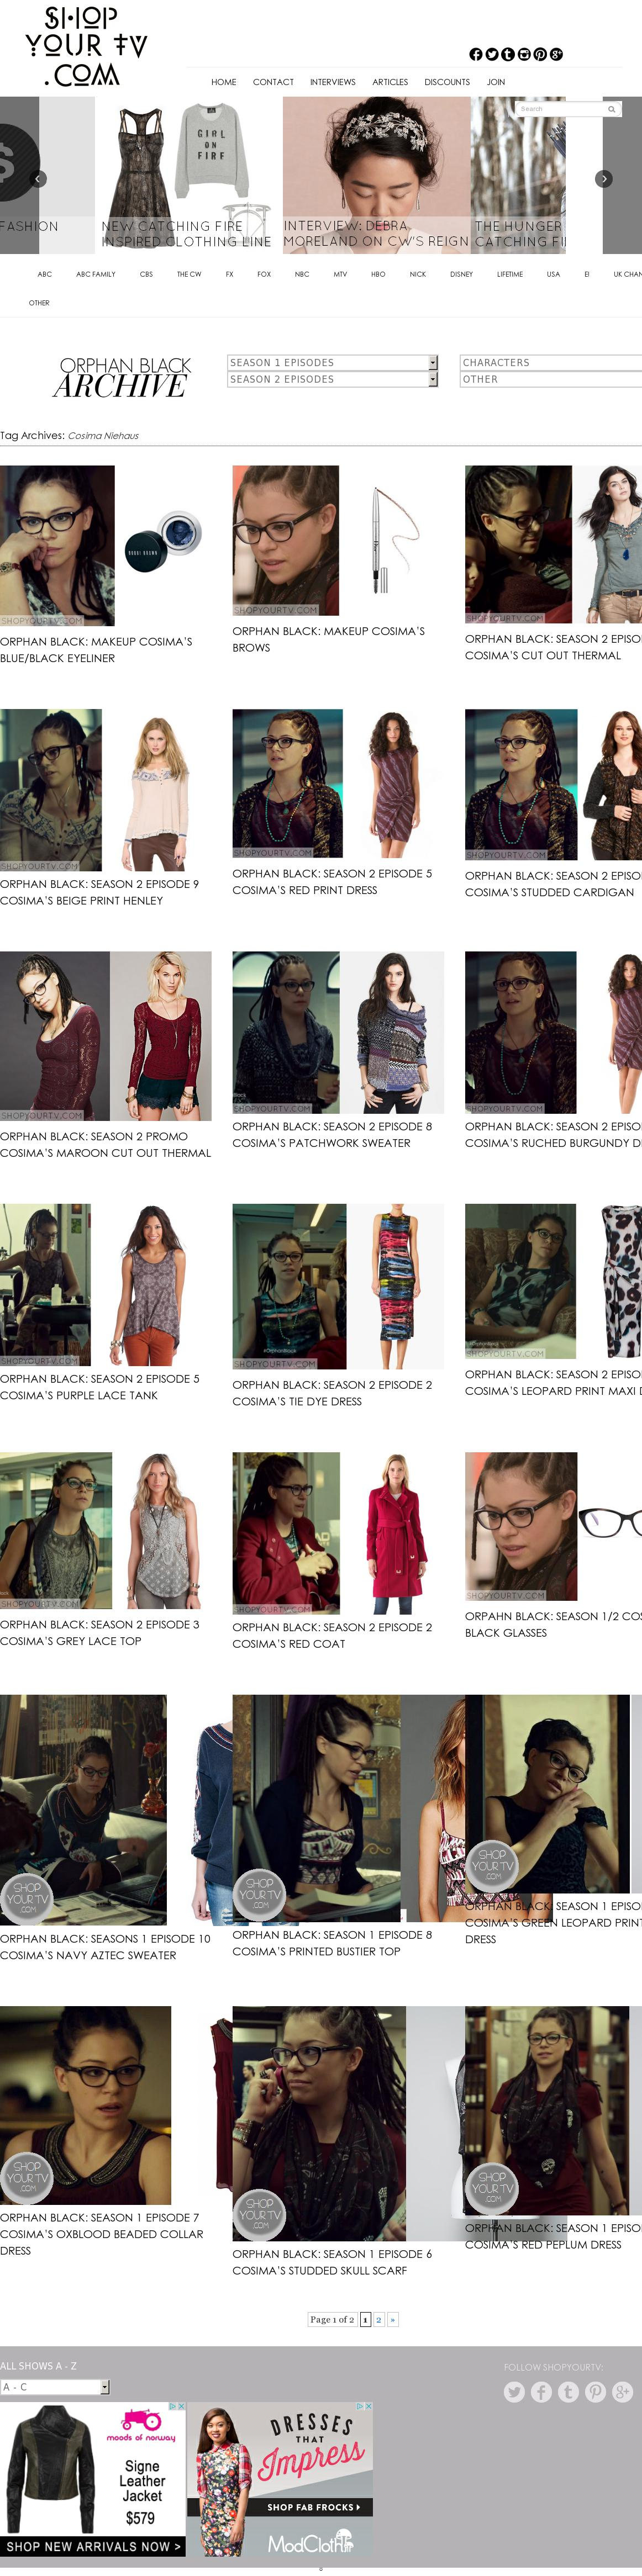 Cosima Niehaus Of Orphan Black Fashion Items Directory The Website